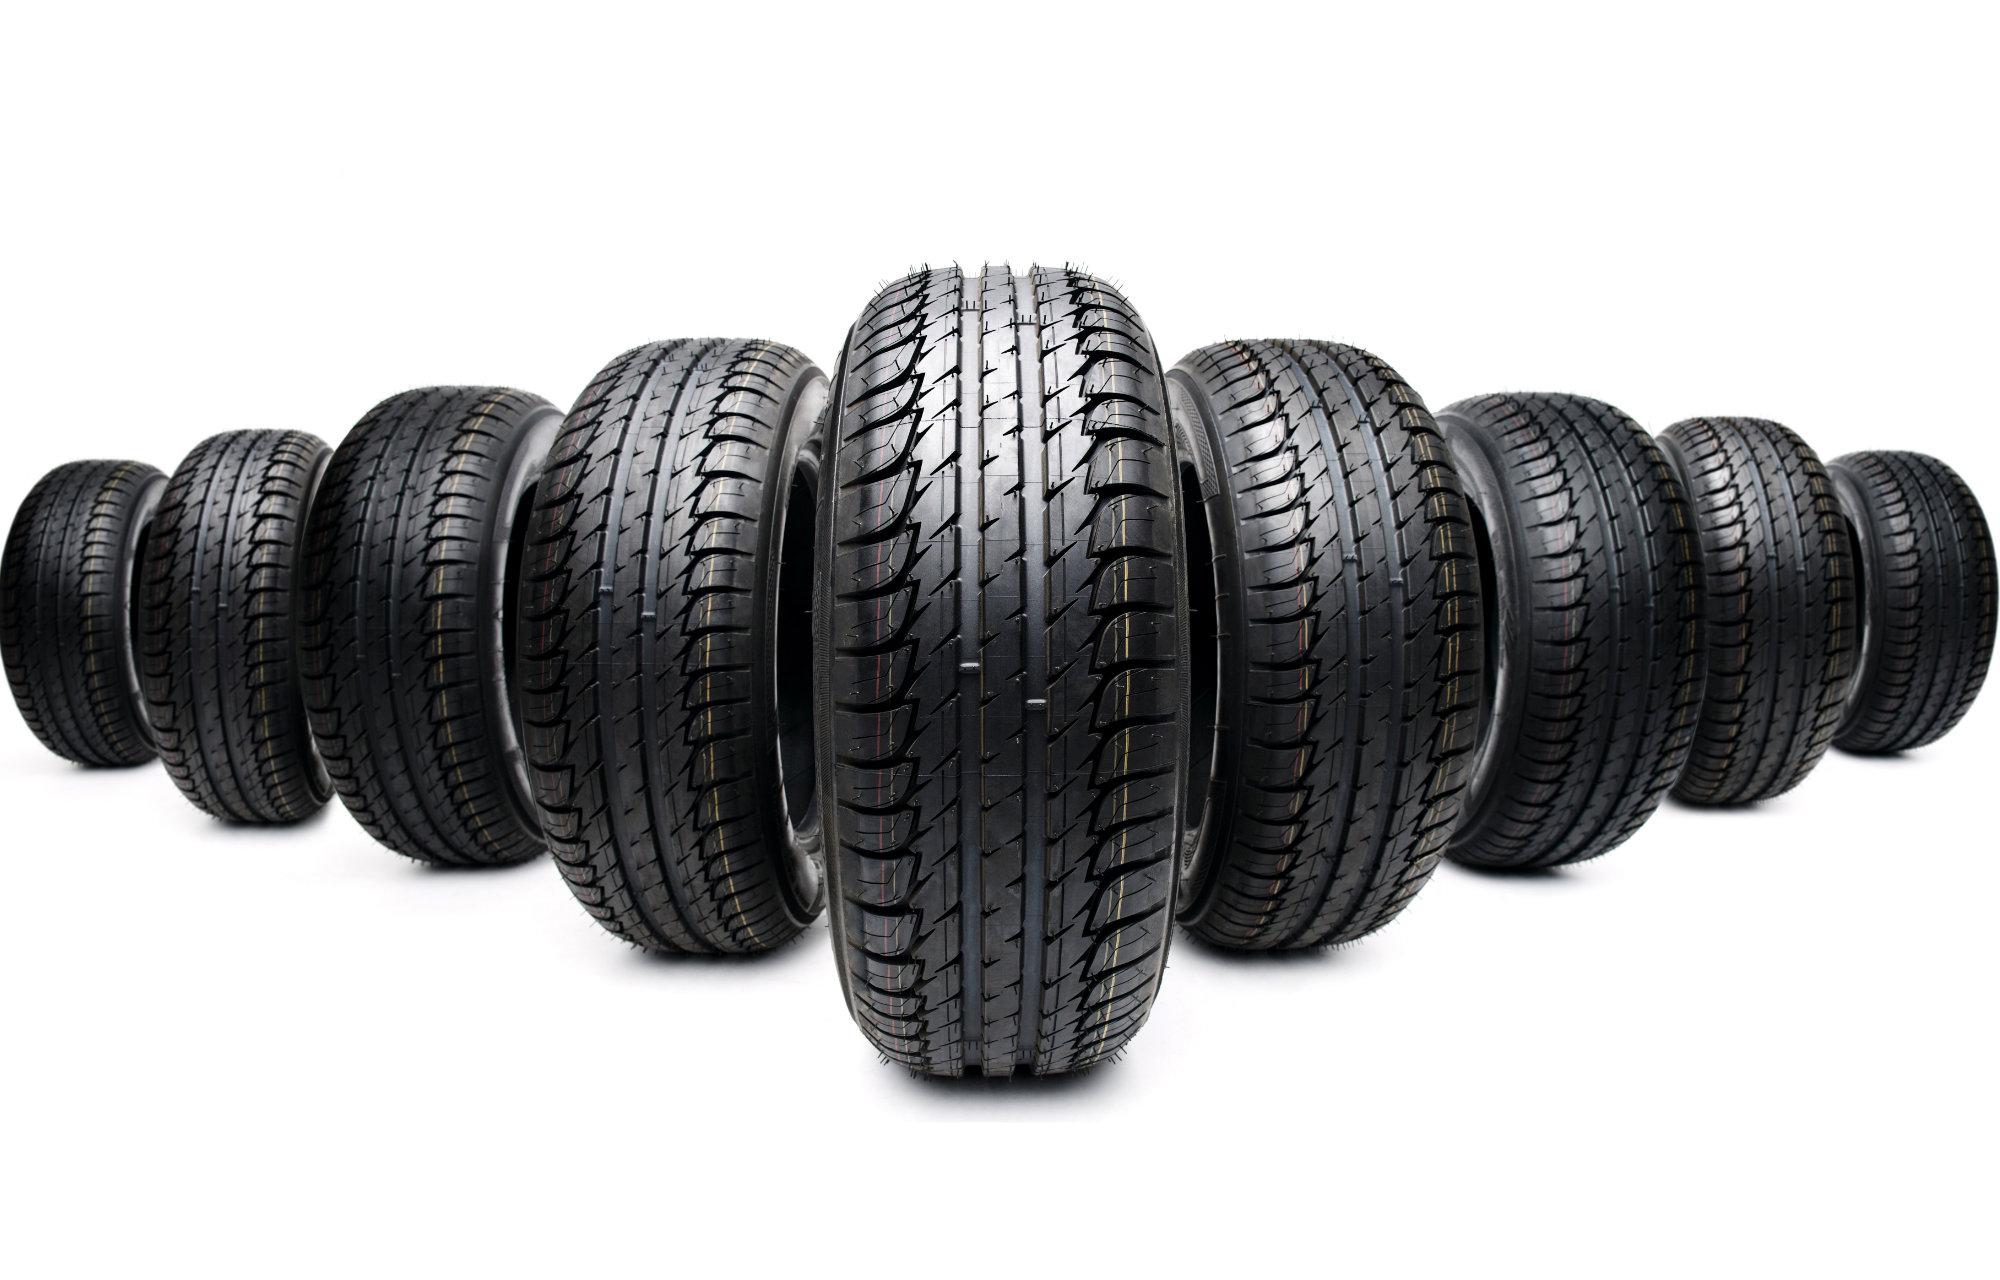 **Changement** de pneus ? **Stockage** de pneus ?